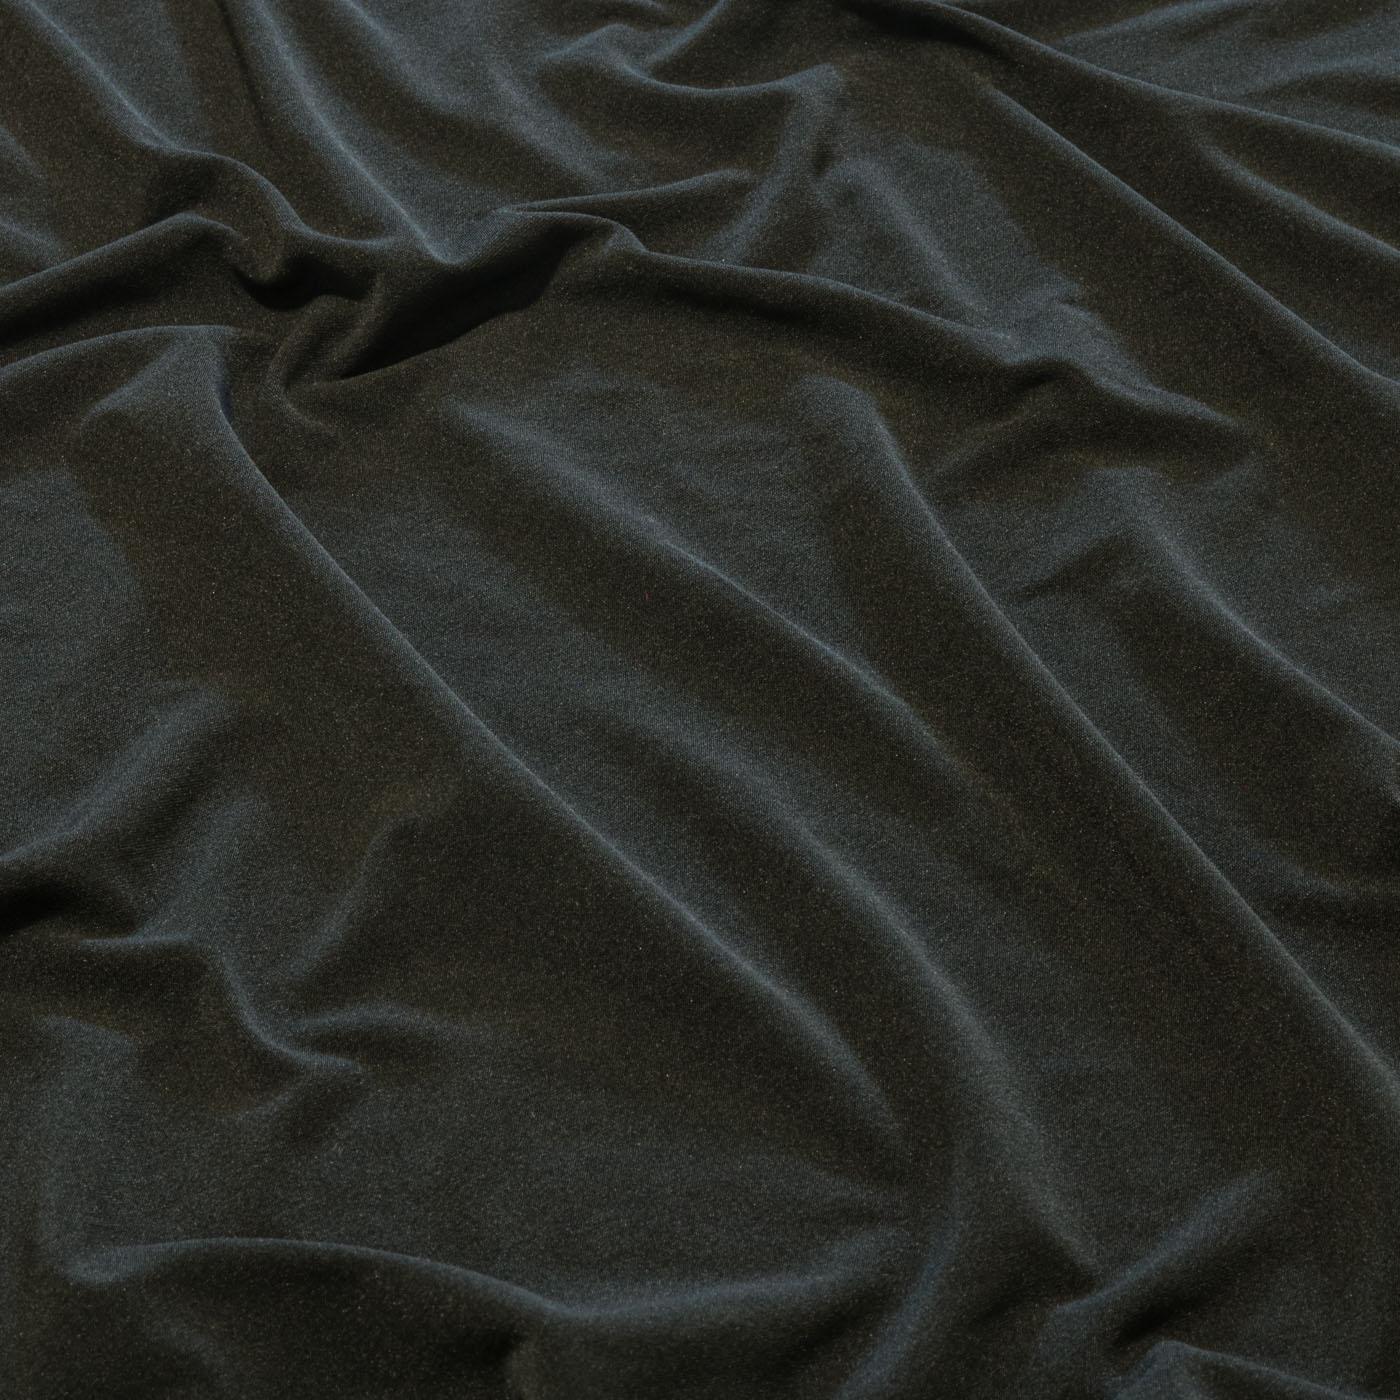 Tecido Malha Liganete Liso  96% Poliéster 4% Elastano  Preto